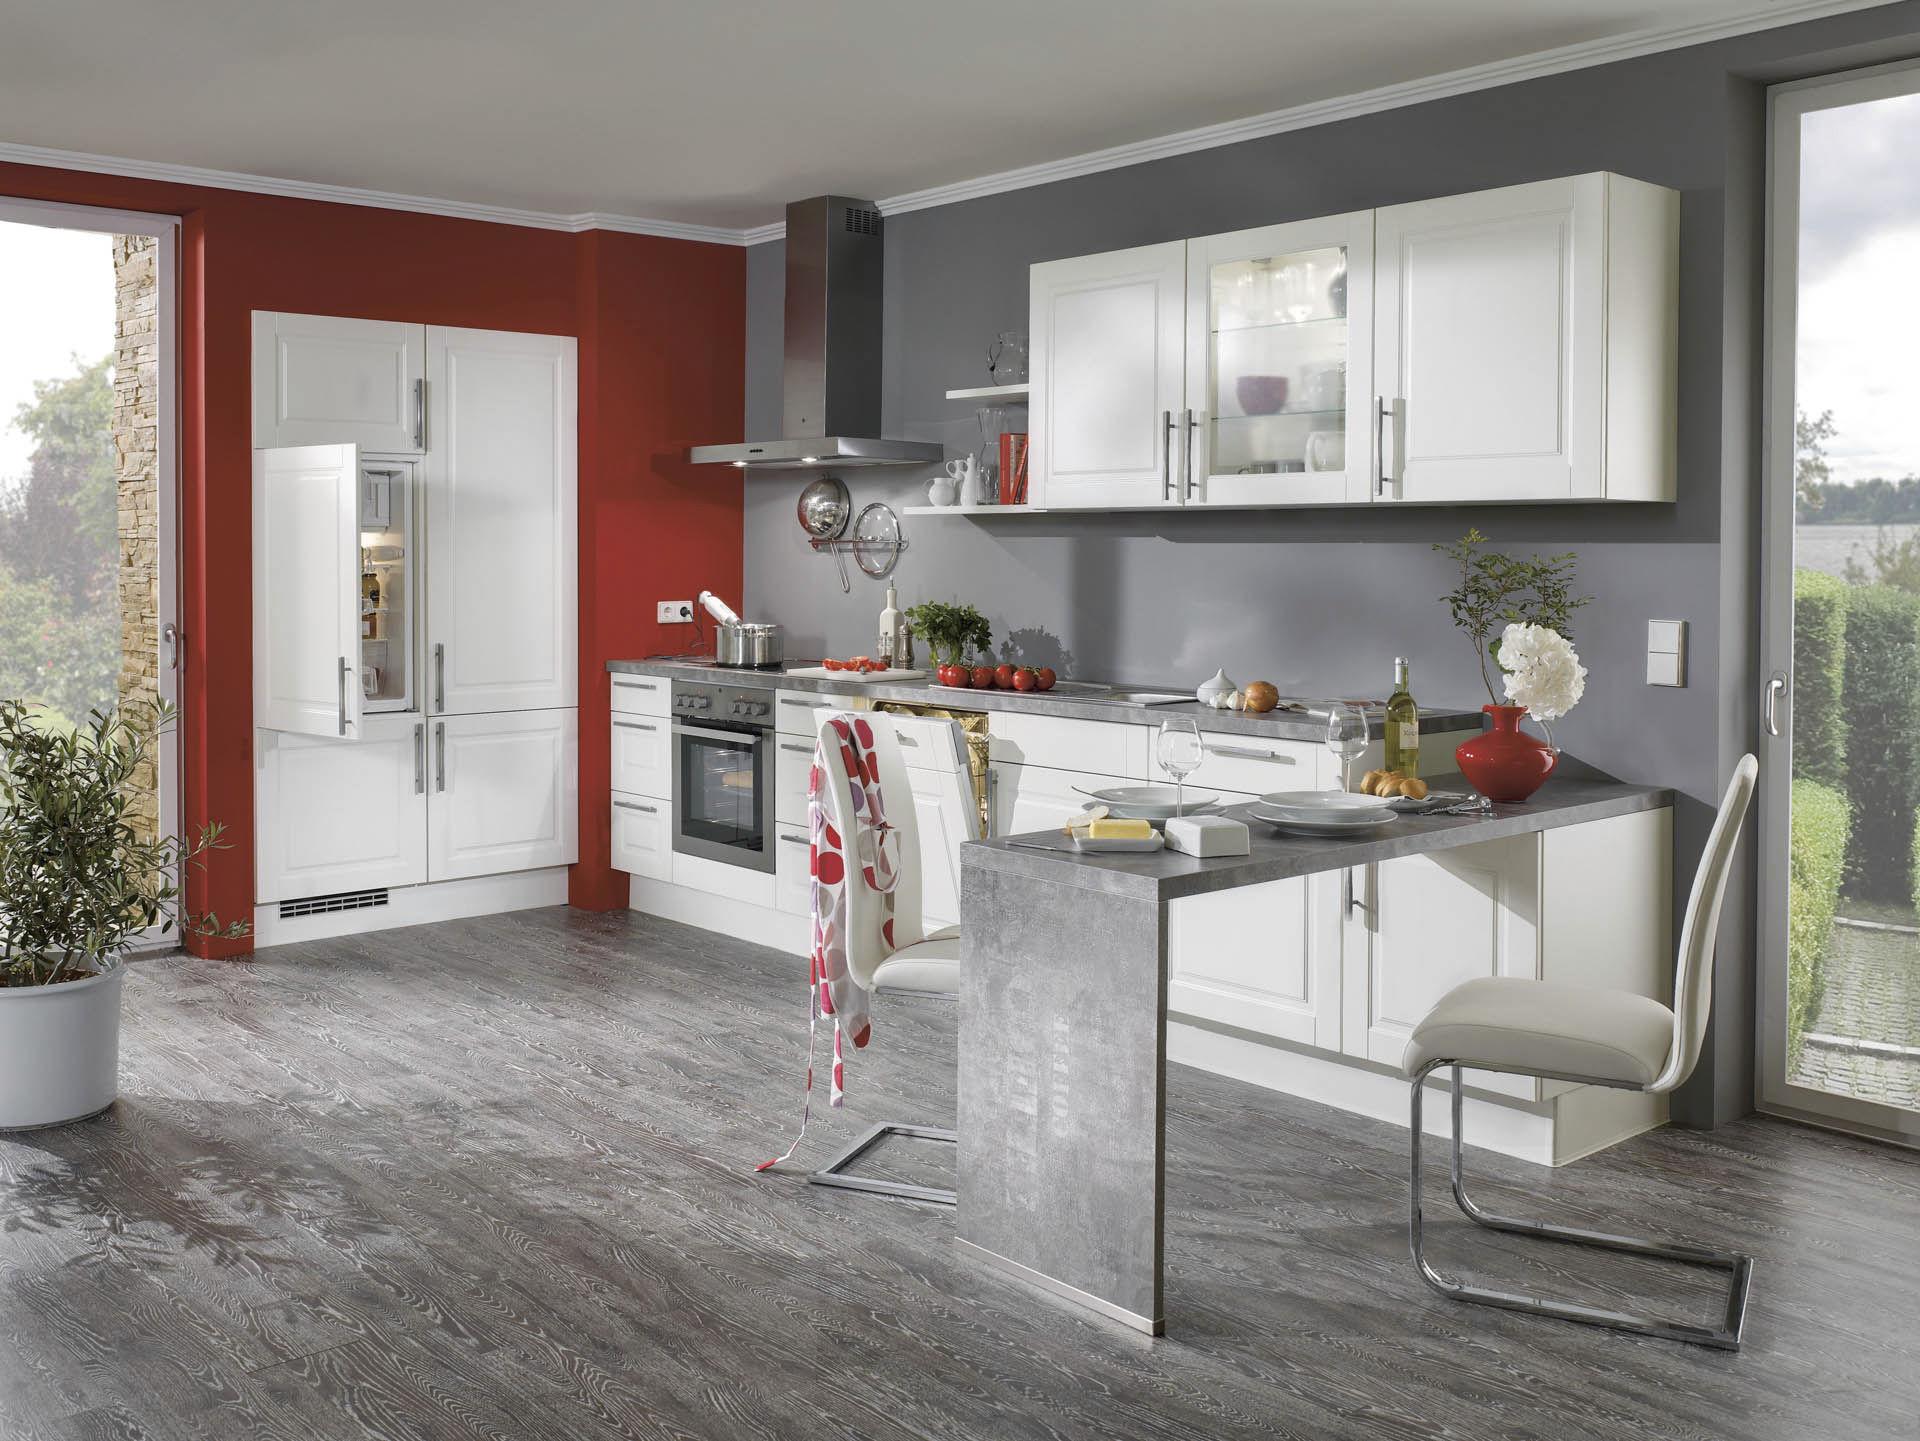 Moderne Küche / aus Marmor / lackiert - AVIANO 471 - nobilia